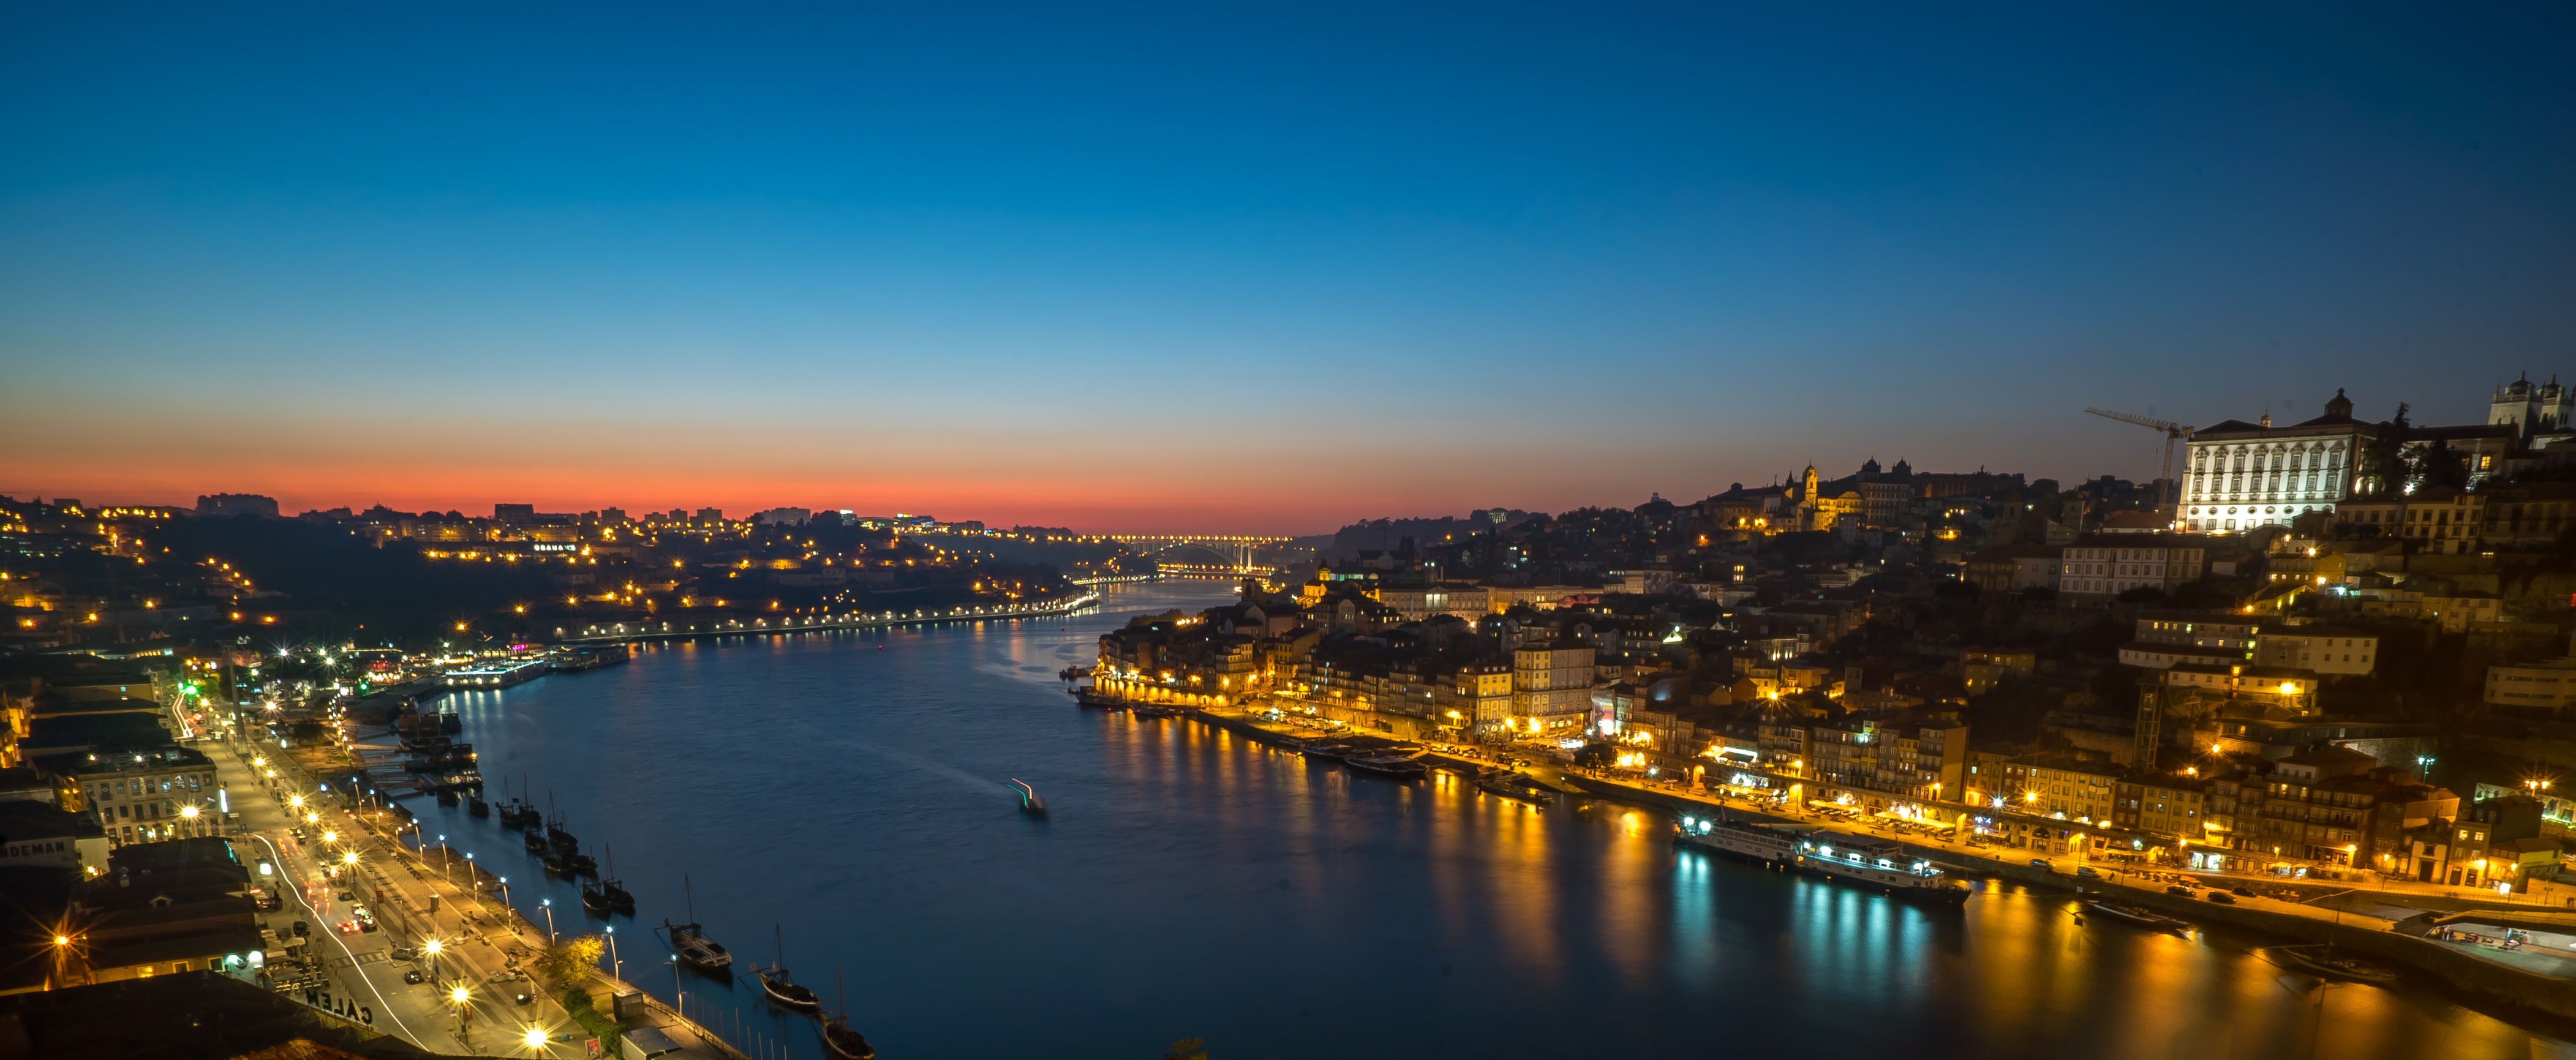 Portugal: Porto, Evora, Coimbra, Lagos, Lisbon